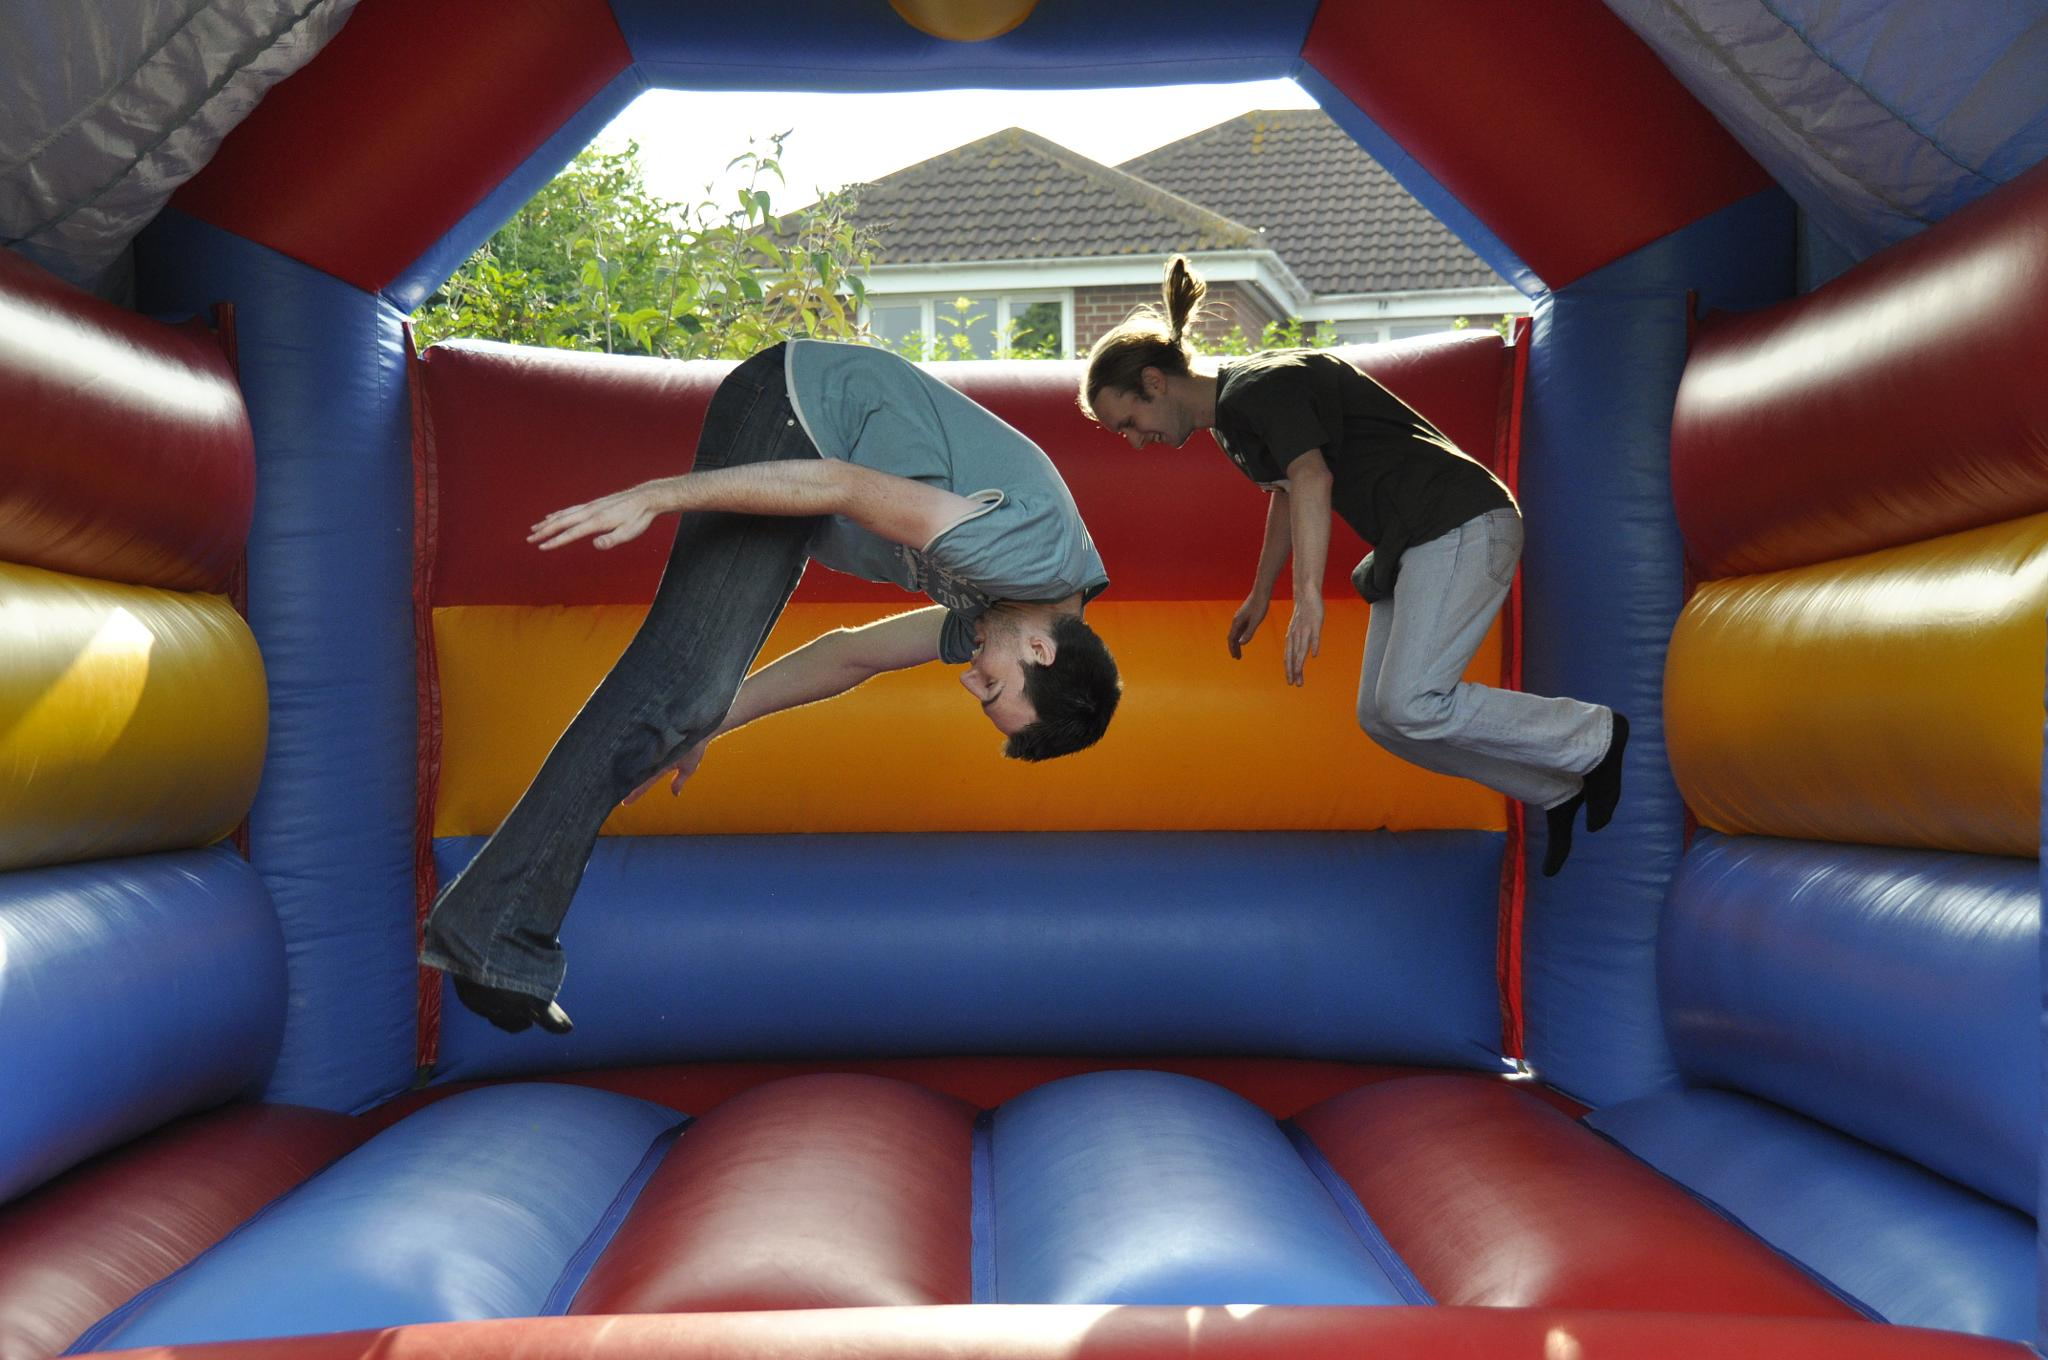 Bouncy bouncy by ashley.cox.1806